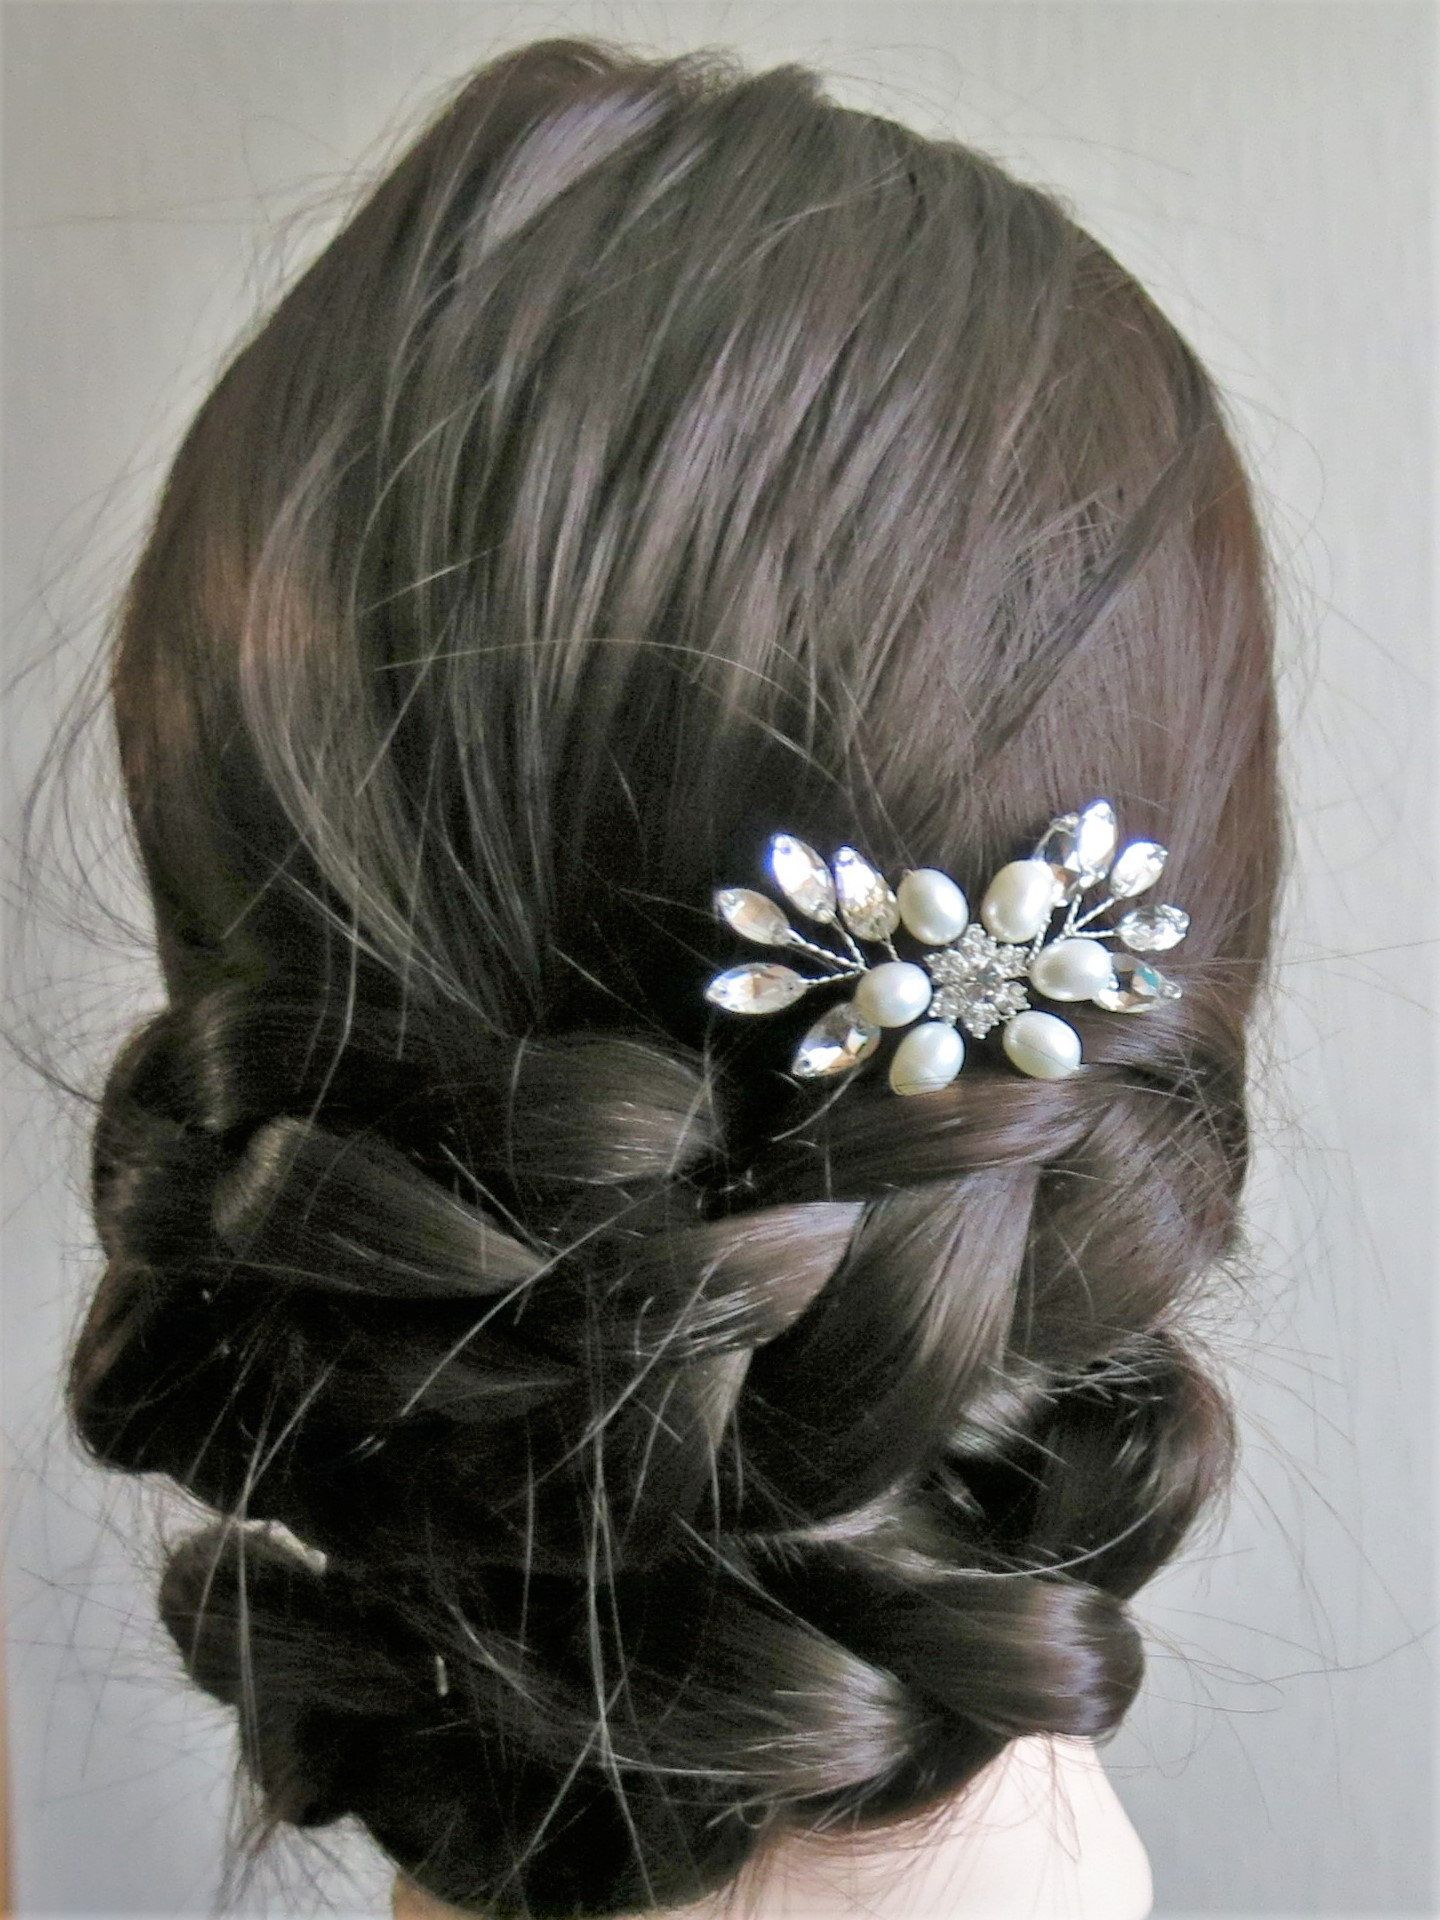 Bridal Hair Pin Bride Hair Piece Prom Headpiece Floral With White Pearls Flower And Crystal Snowfl Bridal Hair Pins Wedding Hair Accessories Bride Hair Piece